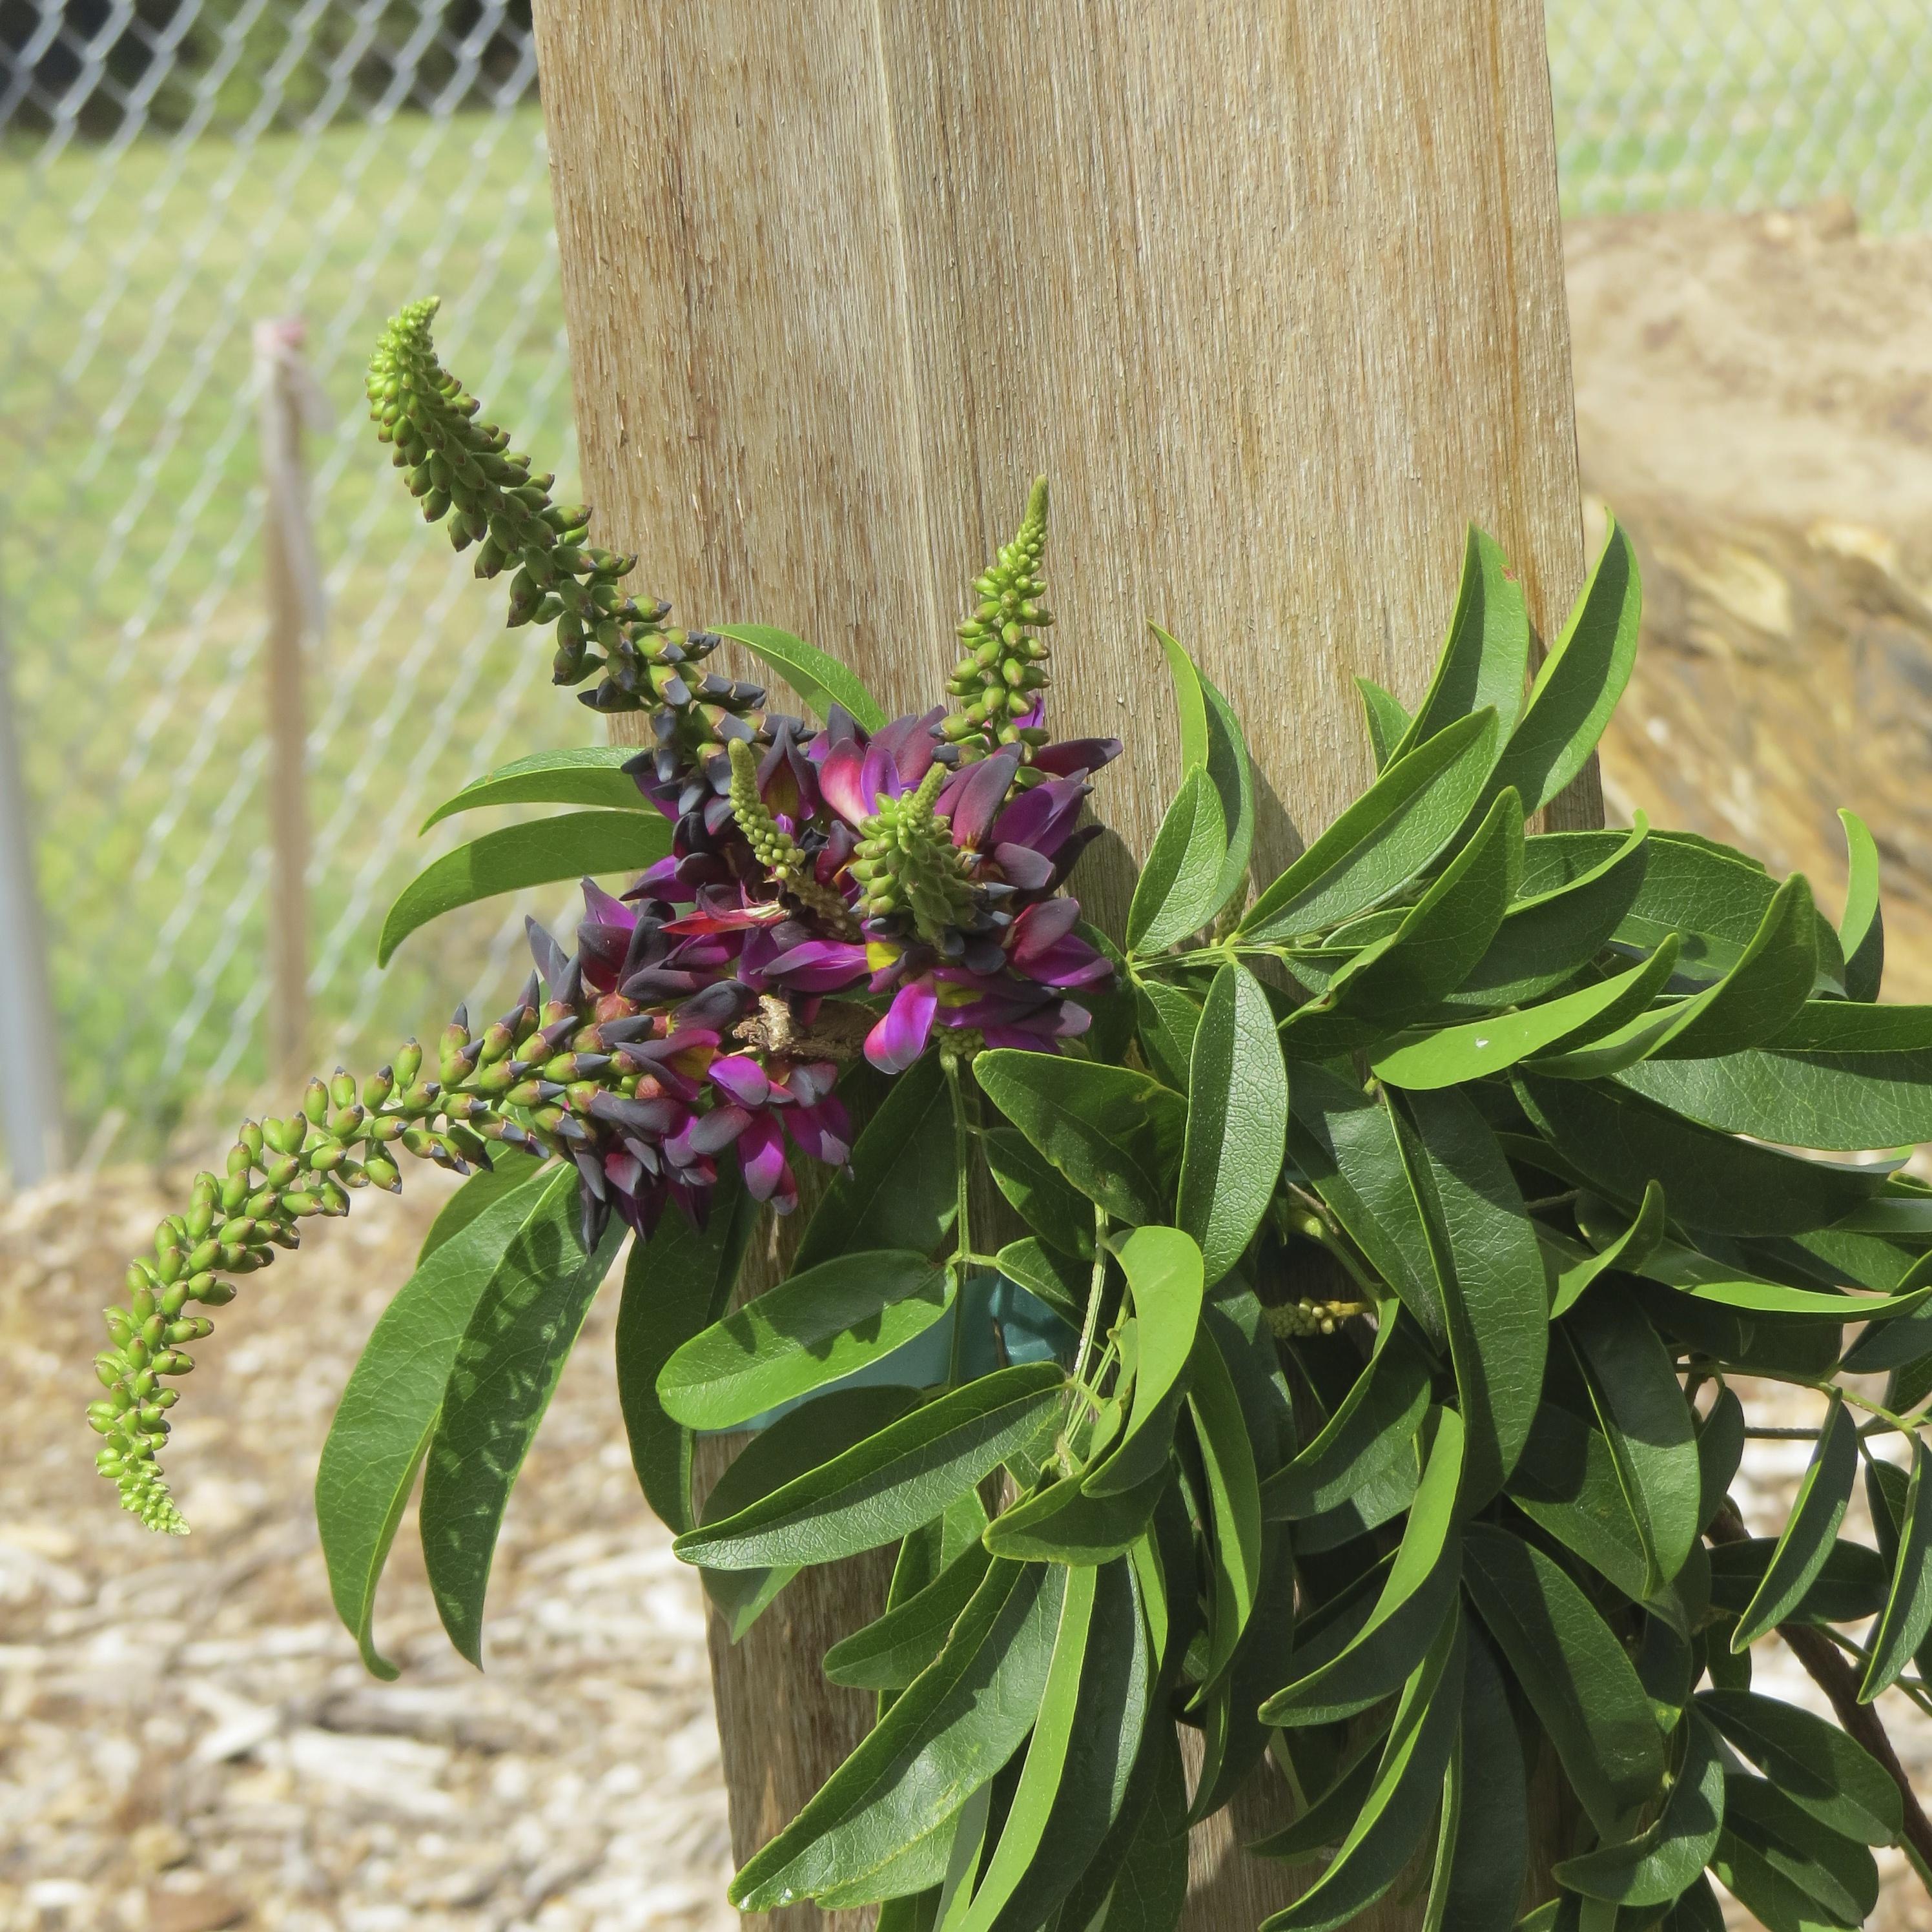 Millettia reticulata Evergreen Wisteria 5 Seeds